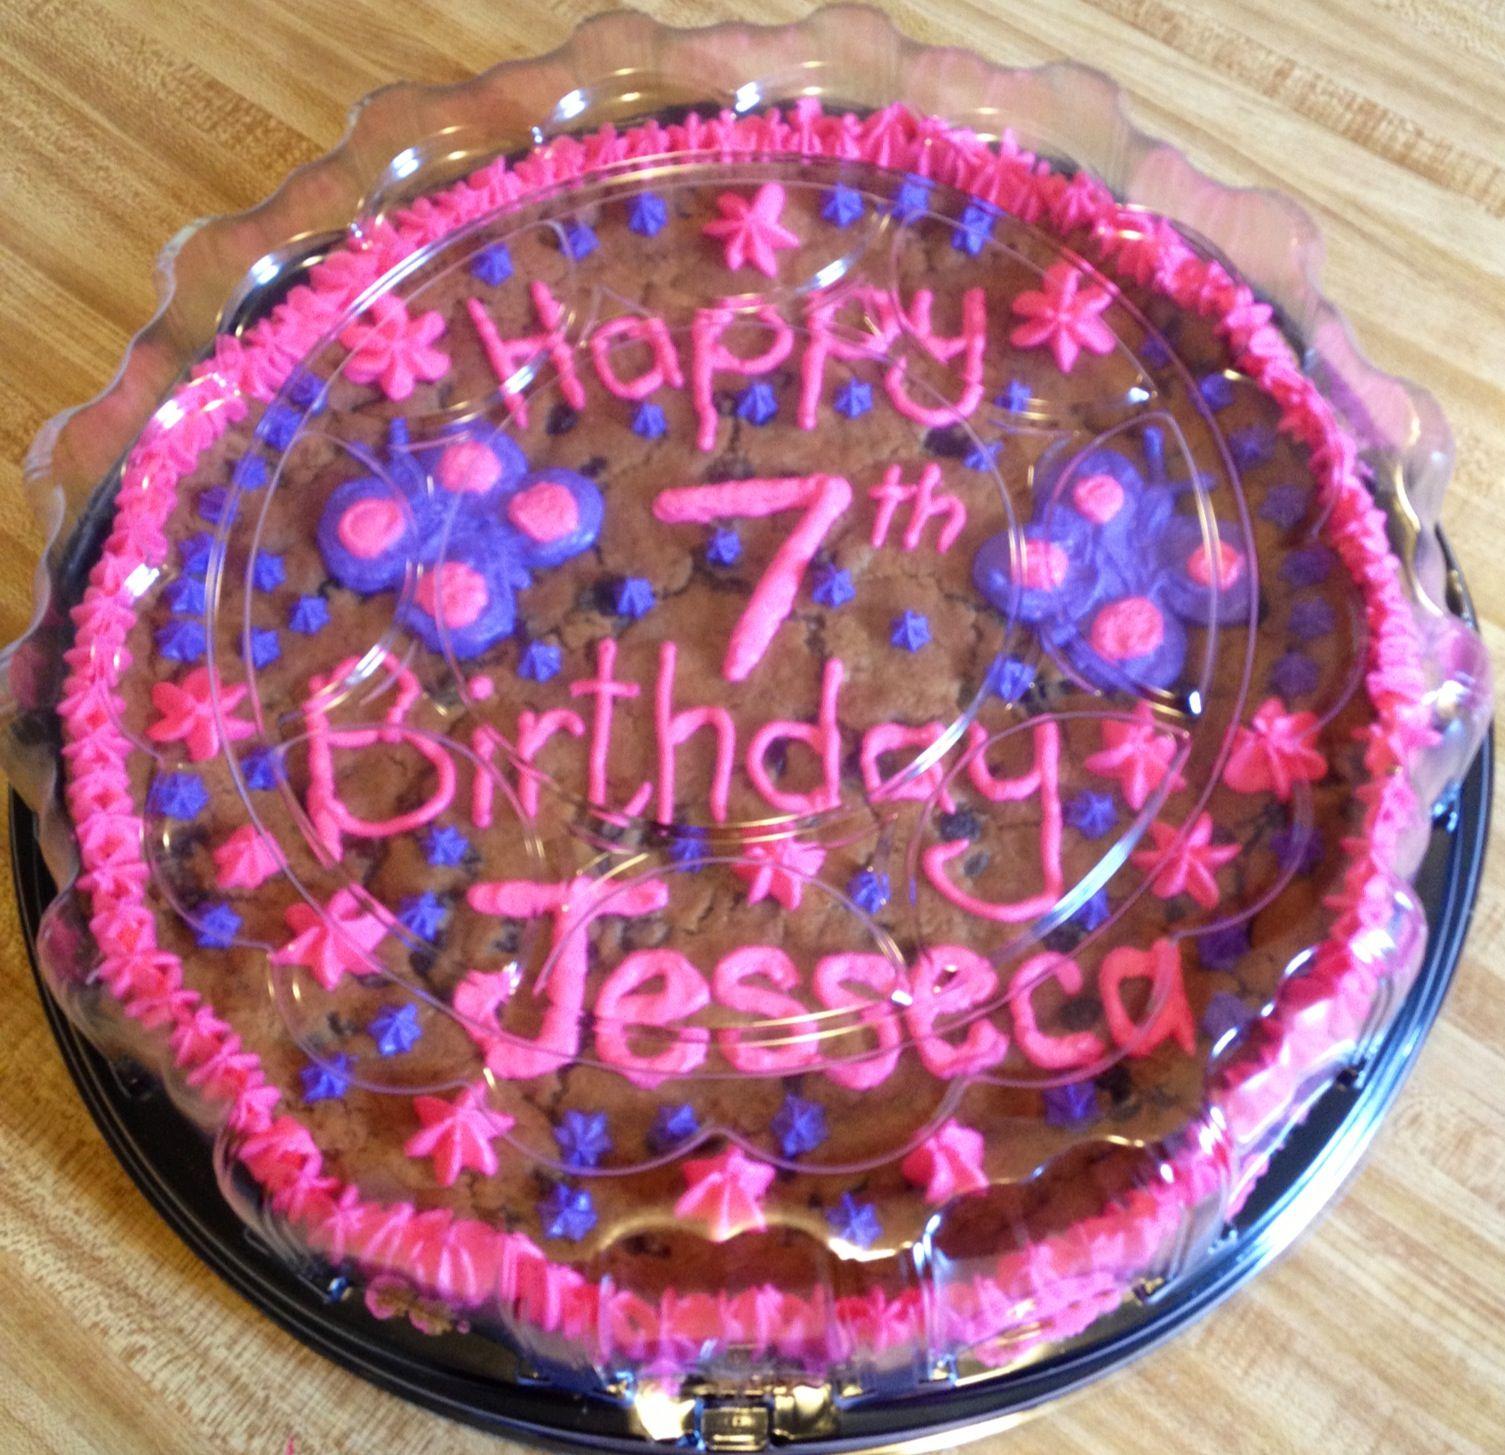 Giant Oatmeal Raisin Birthday Cookie